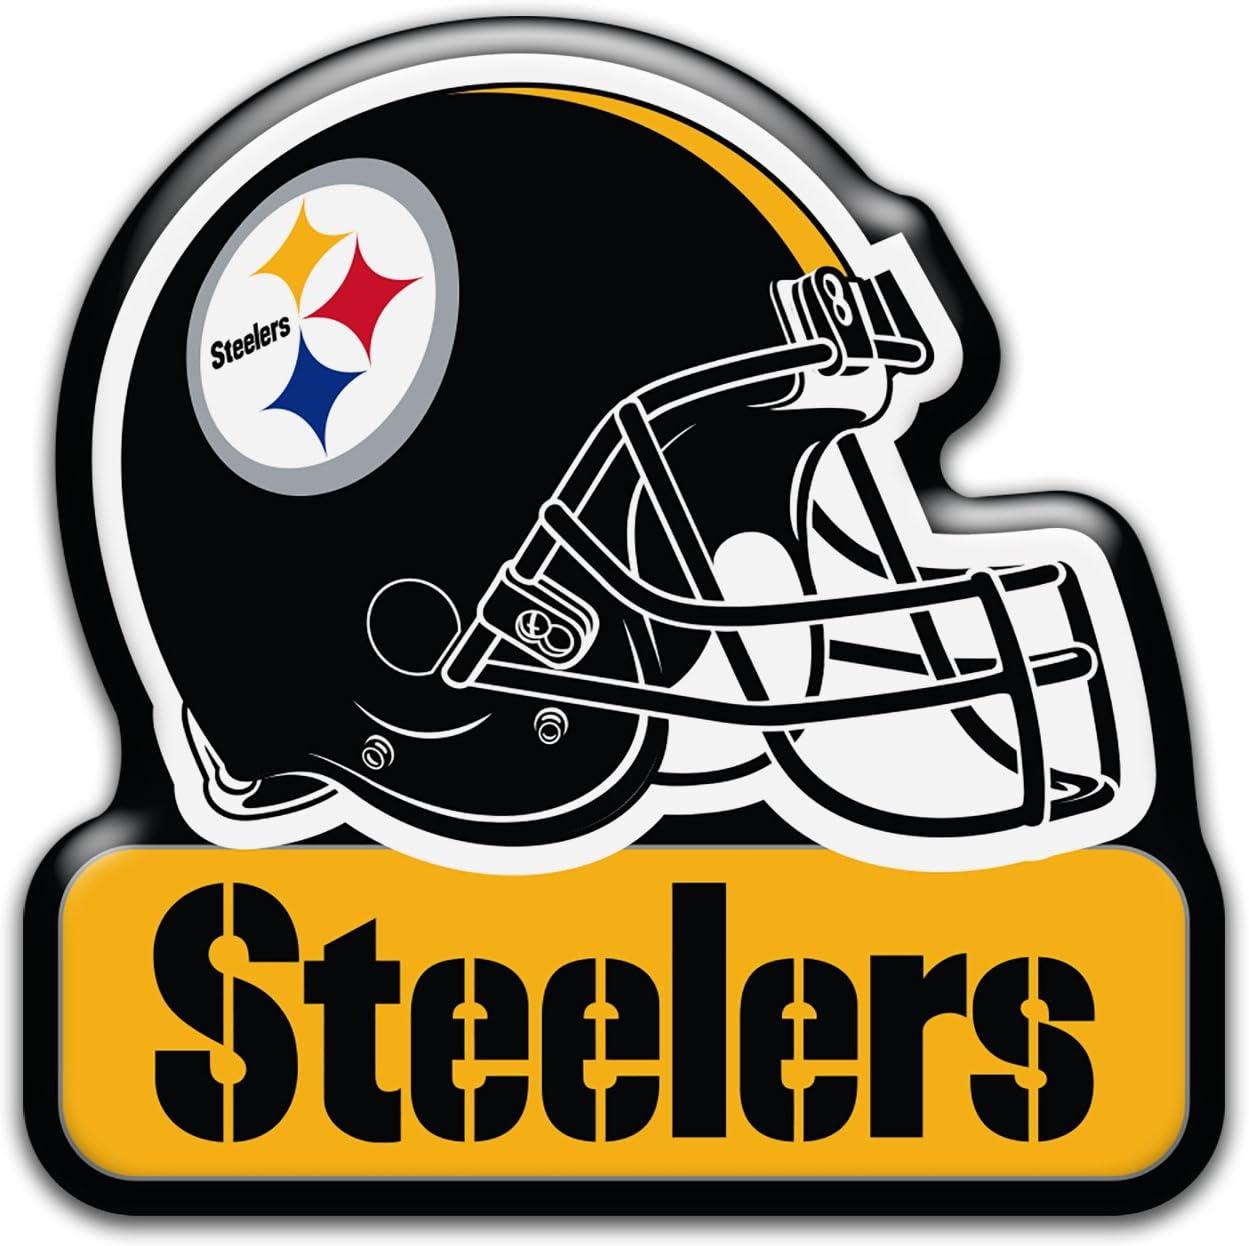 "Aminco NFL Pittsburgh Steelers 3"""" Heavy Duty Helmet Magnet, Black, 4.5 (NFL-MG-1067-12) : Sports & Outdoors"